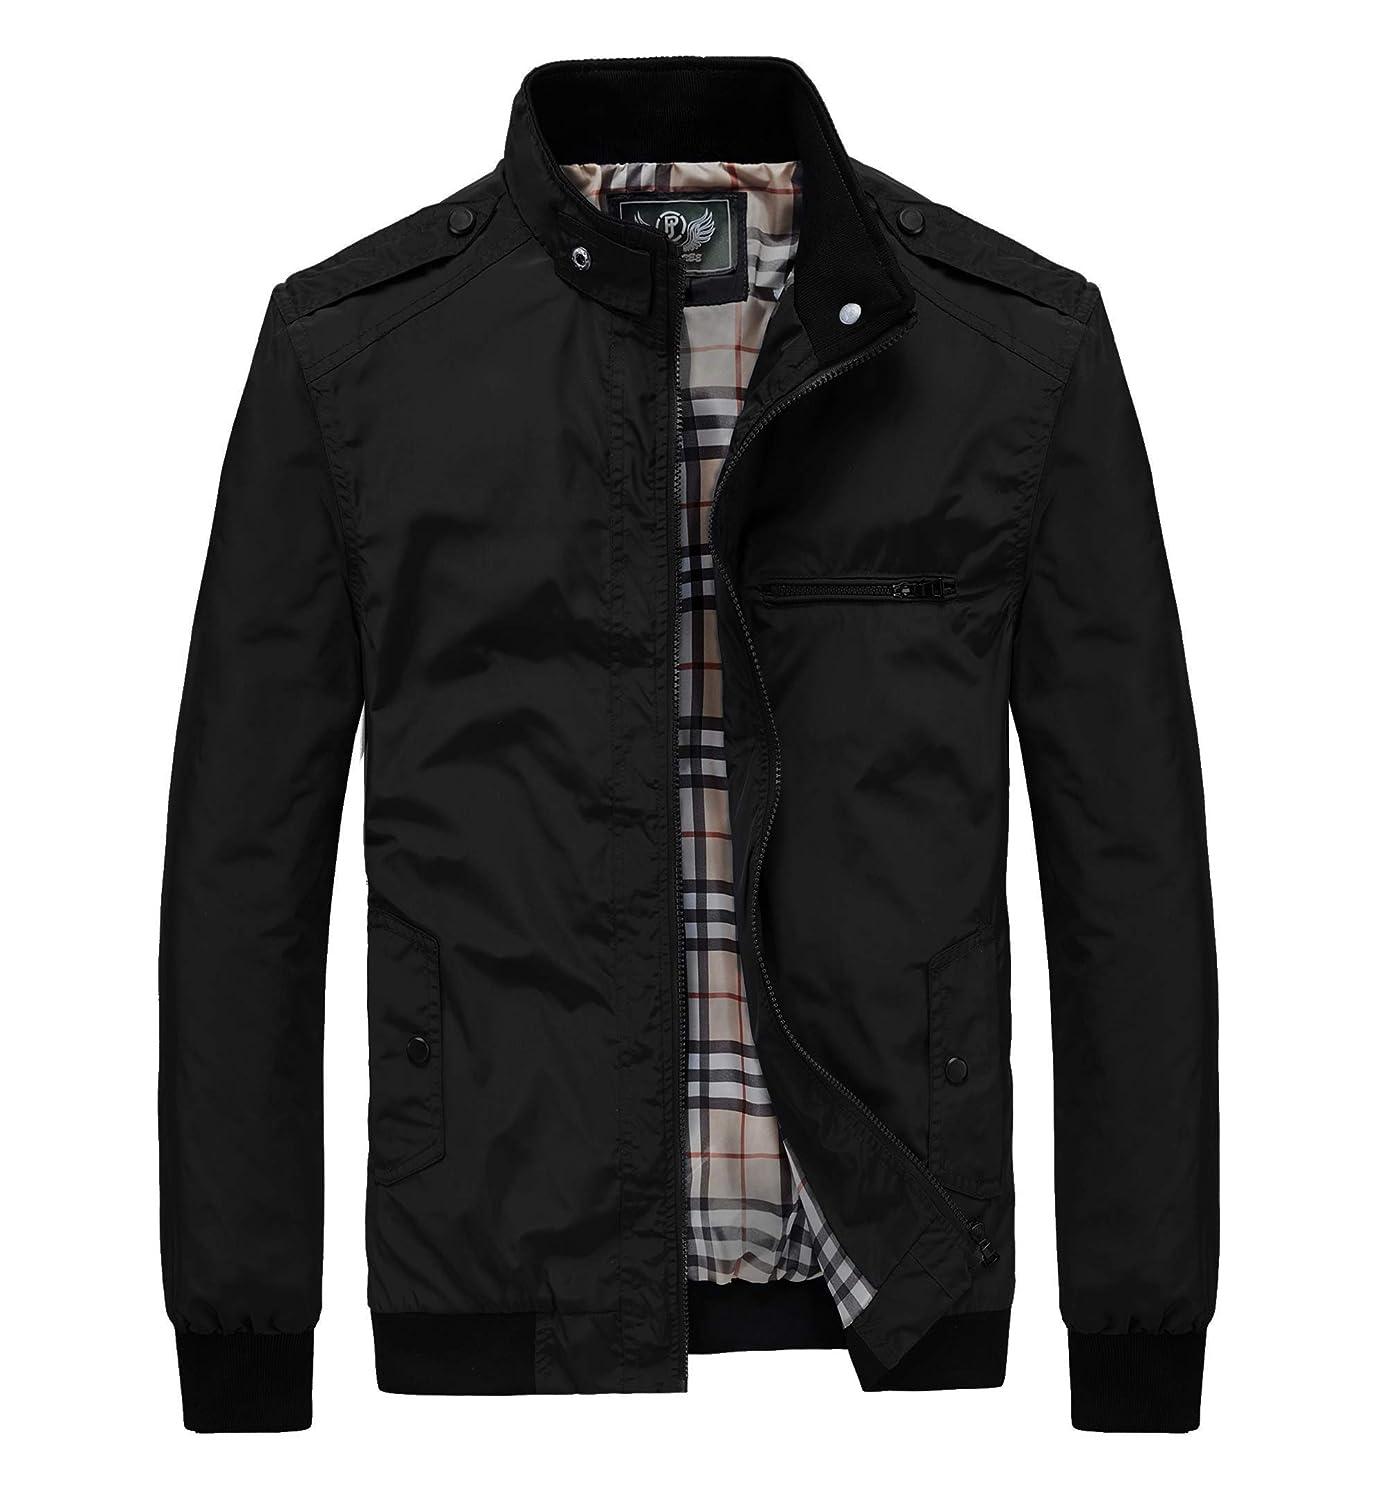 RongYue Men's Casual Lightweight Jacket Spring Softshell Bomber Windbreaker Jackets